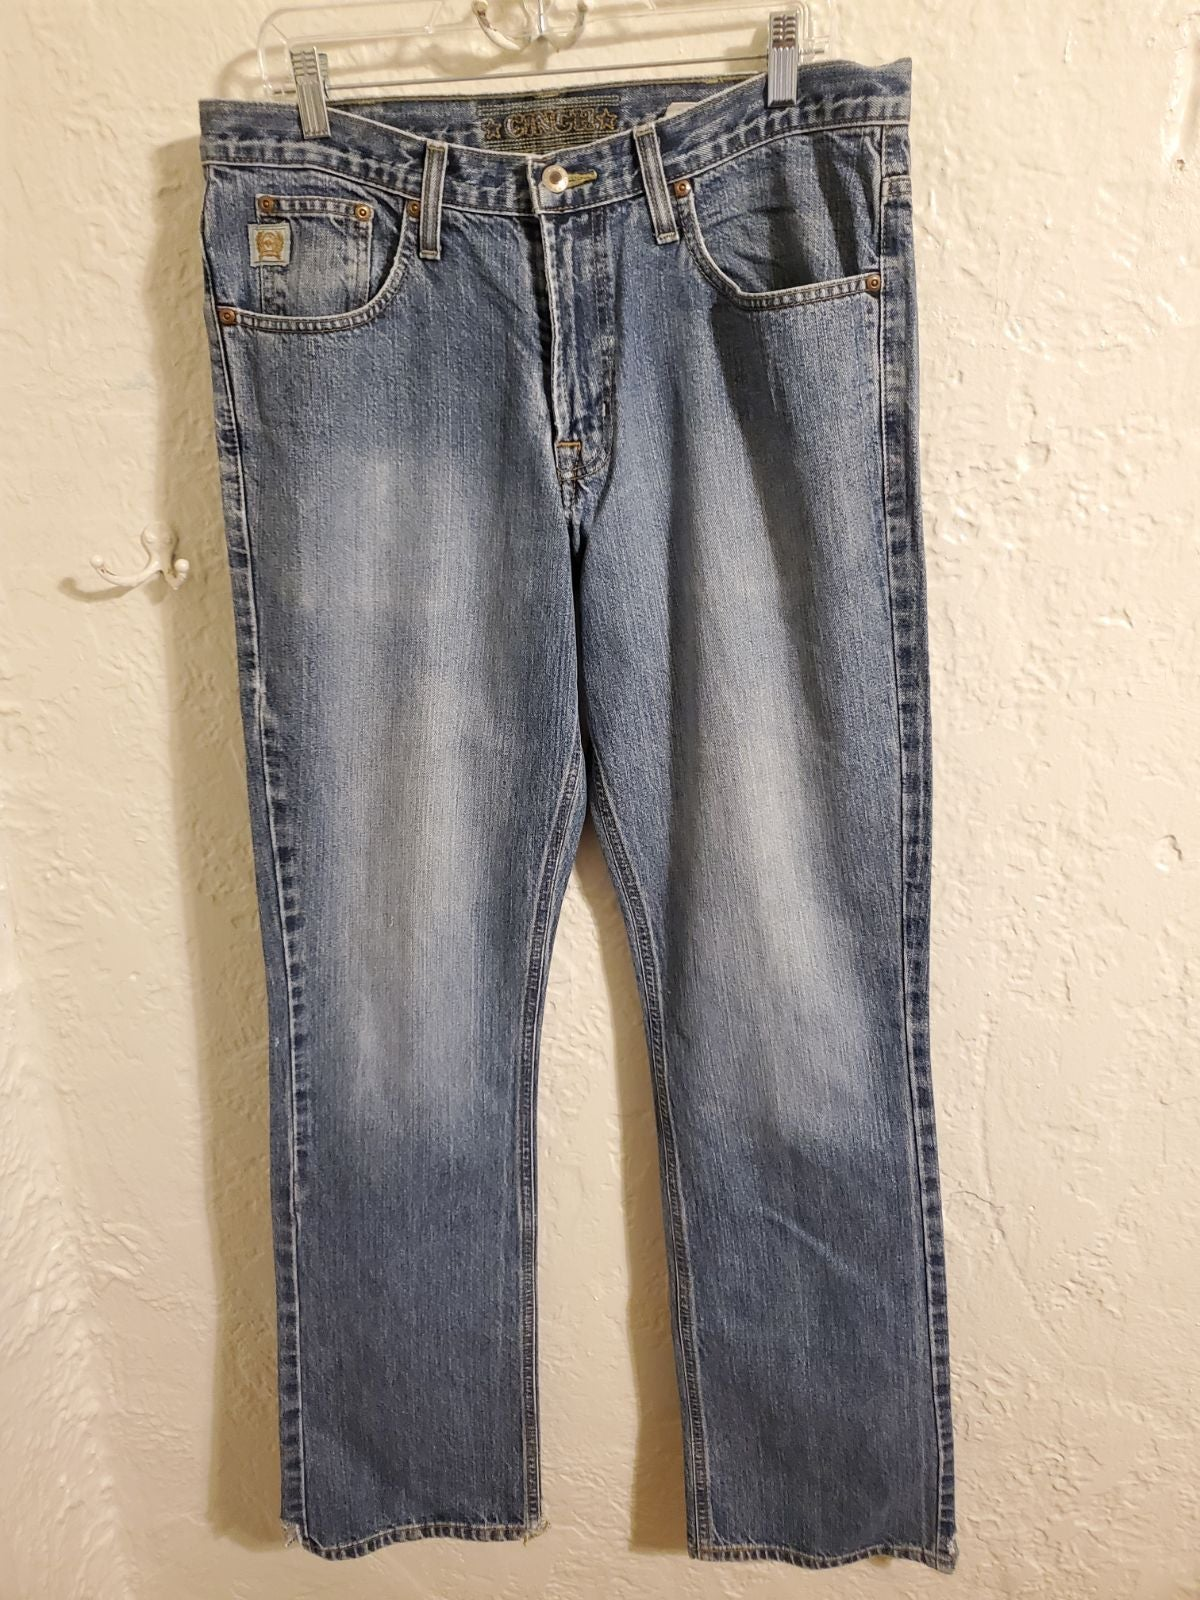 Cinch Jeans 34x36